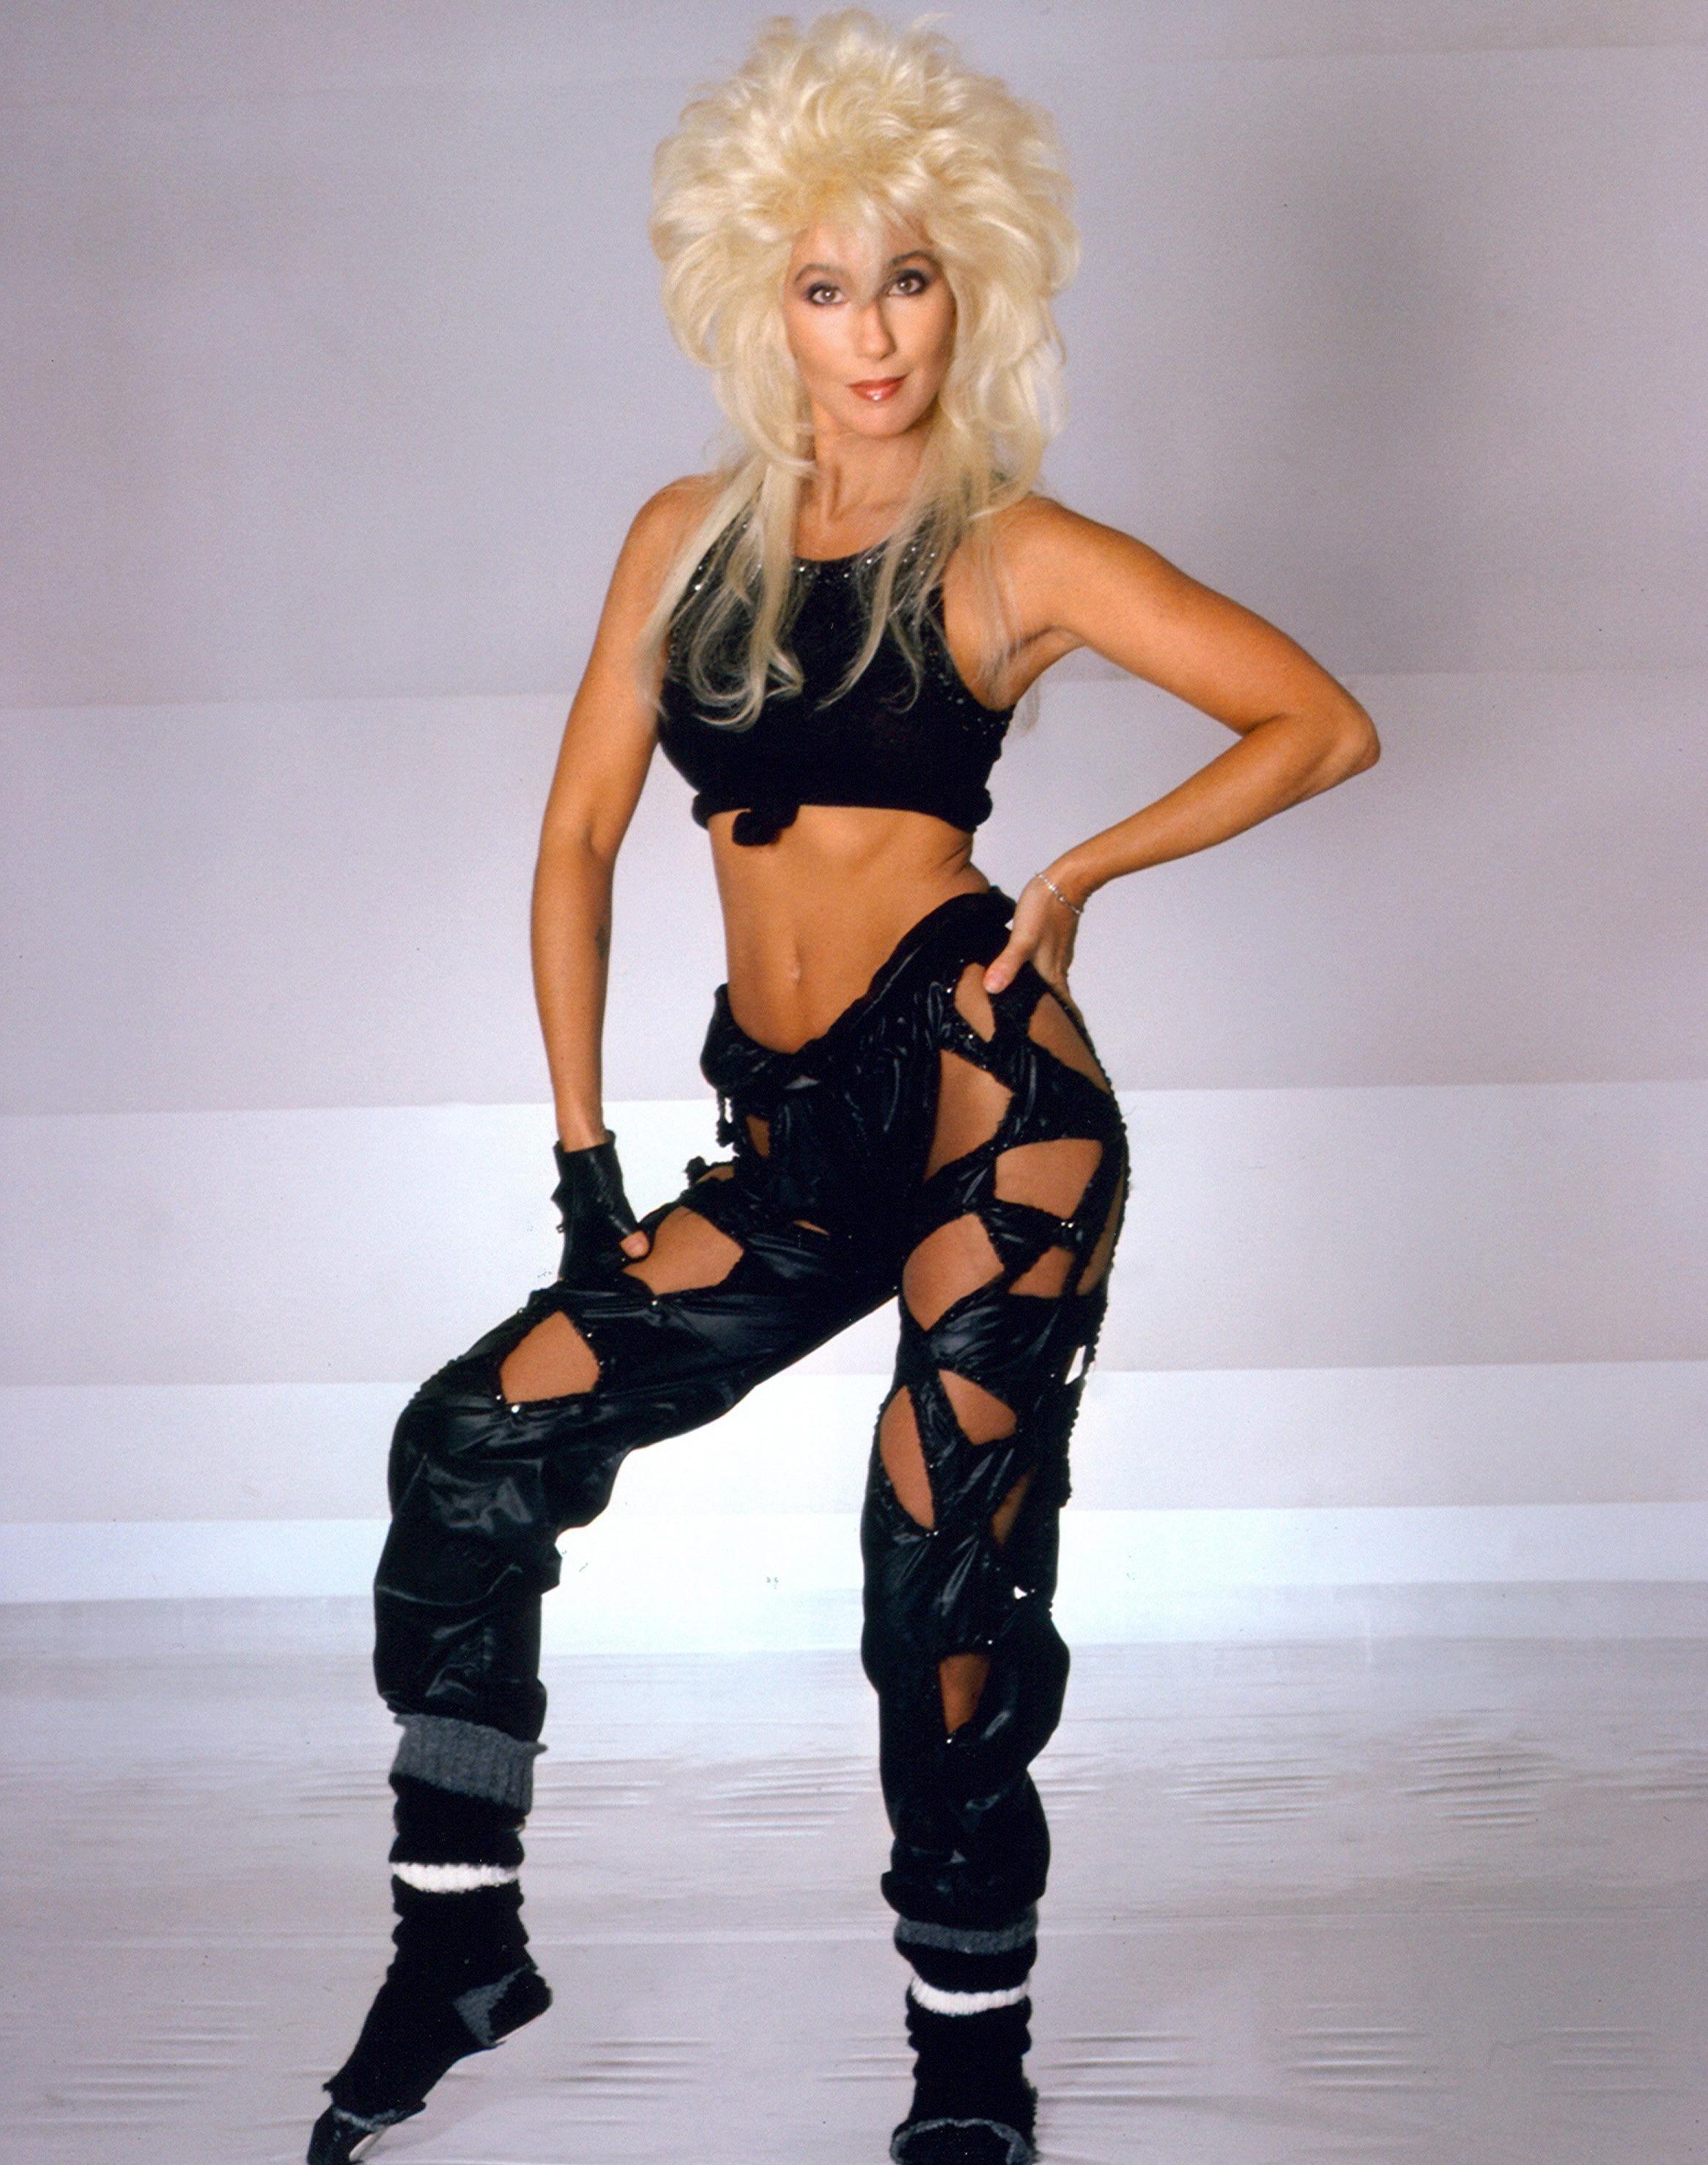 Cher in Los Angeles in Jan. 1984.